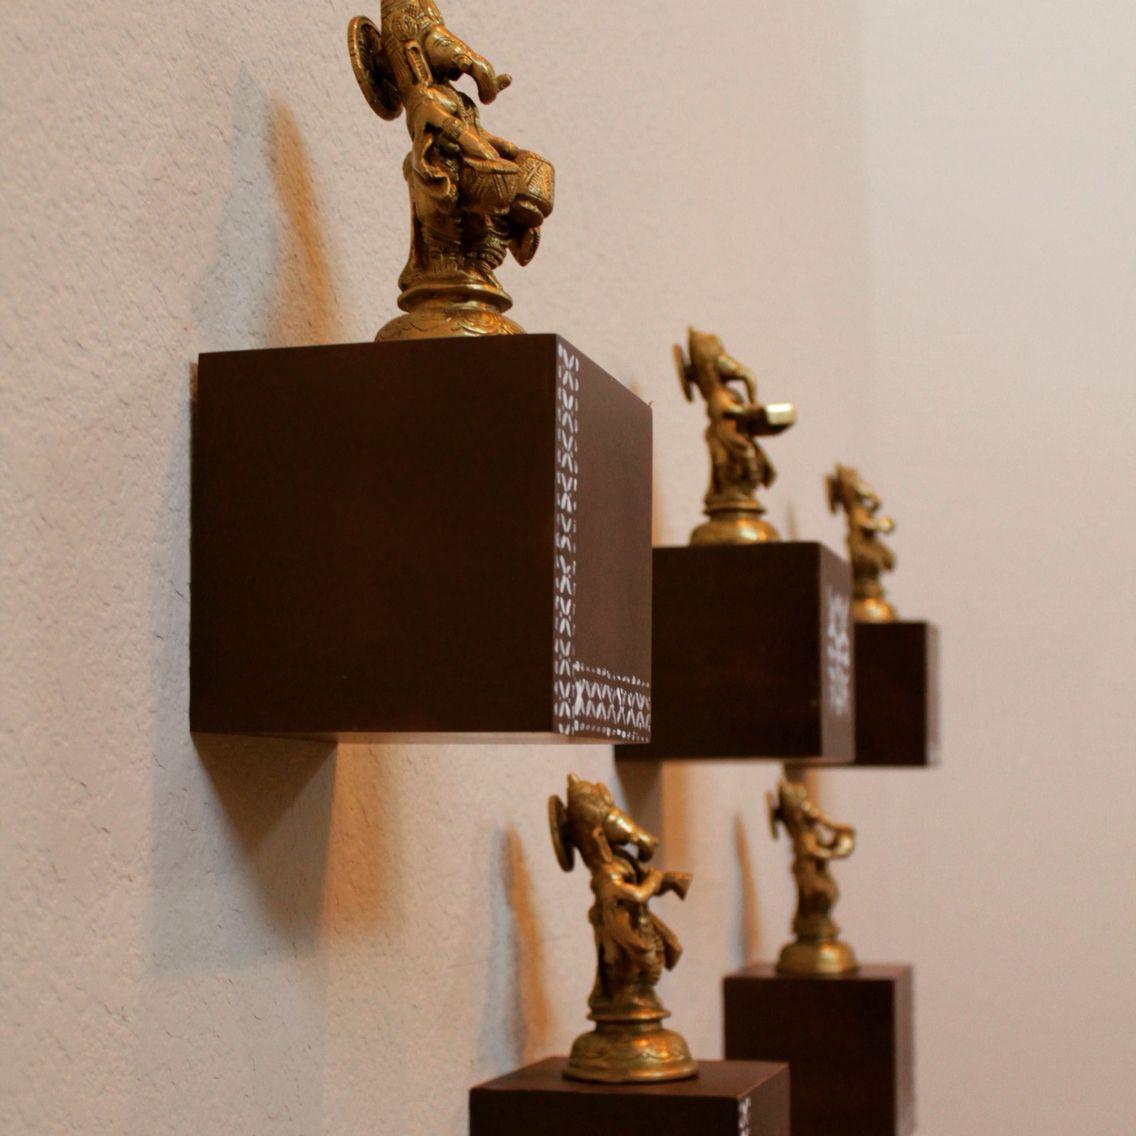 Brass Collections. Brass Deities. Indian. Home Decor